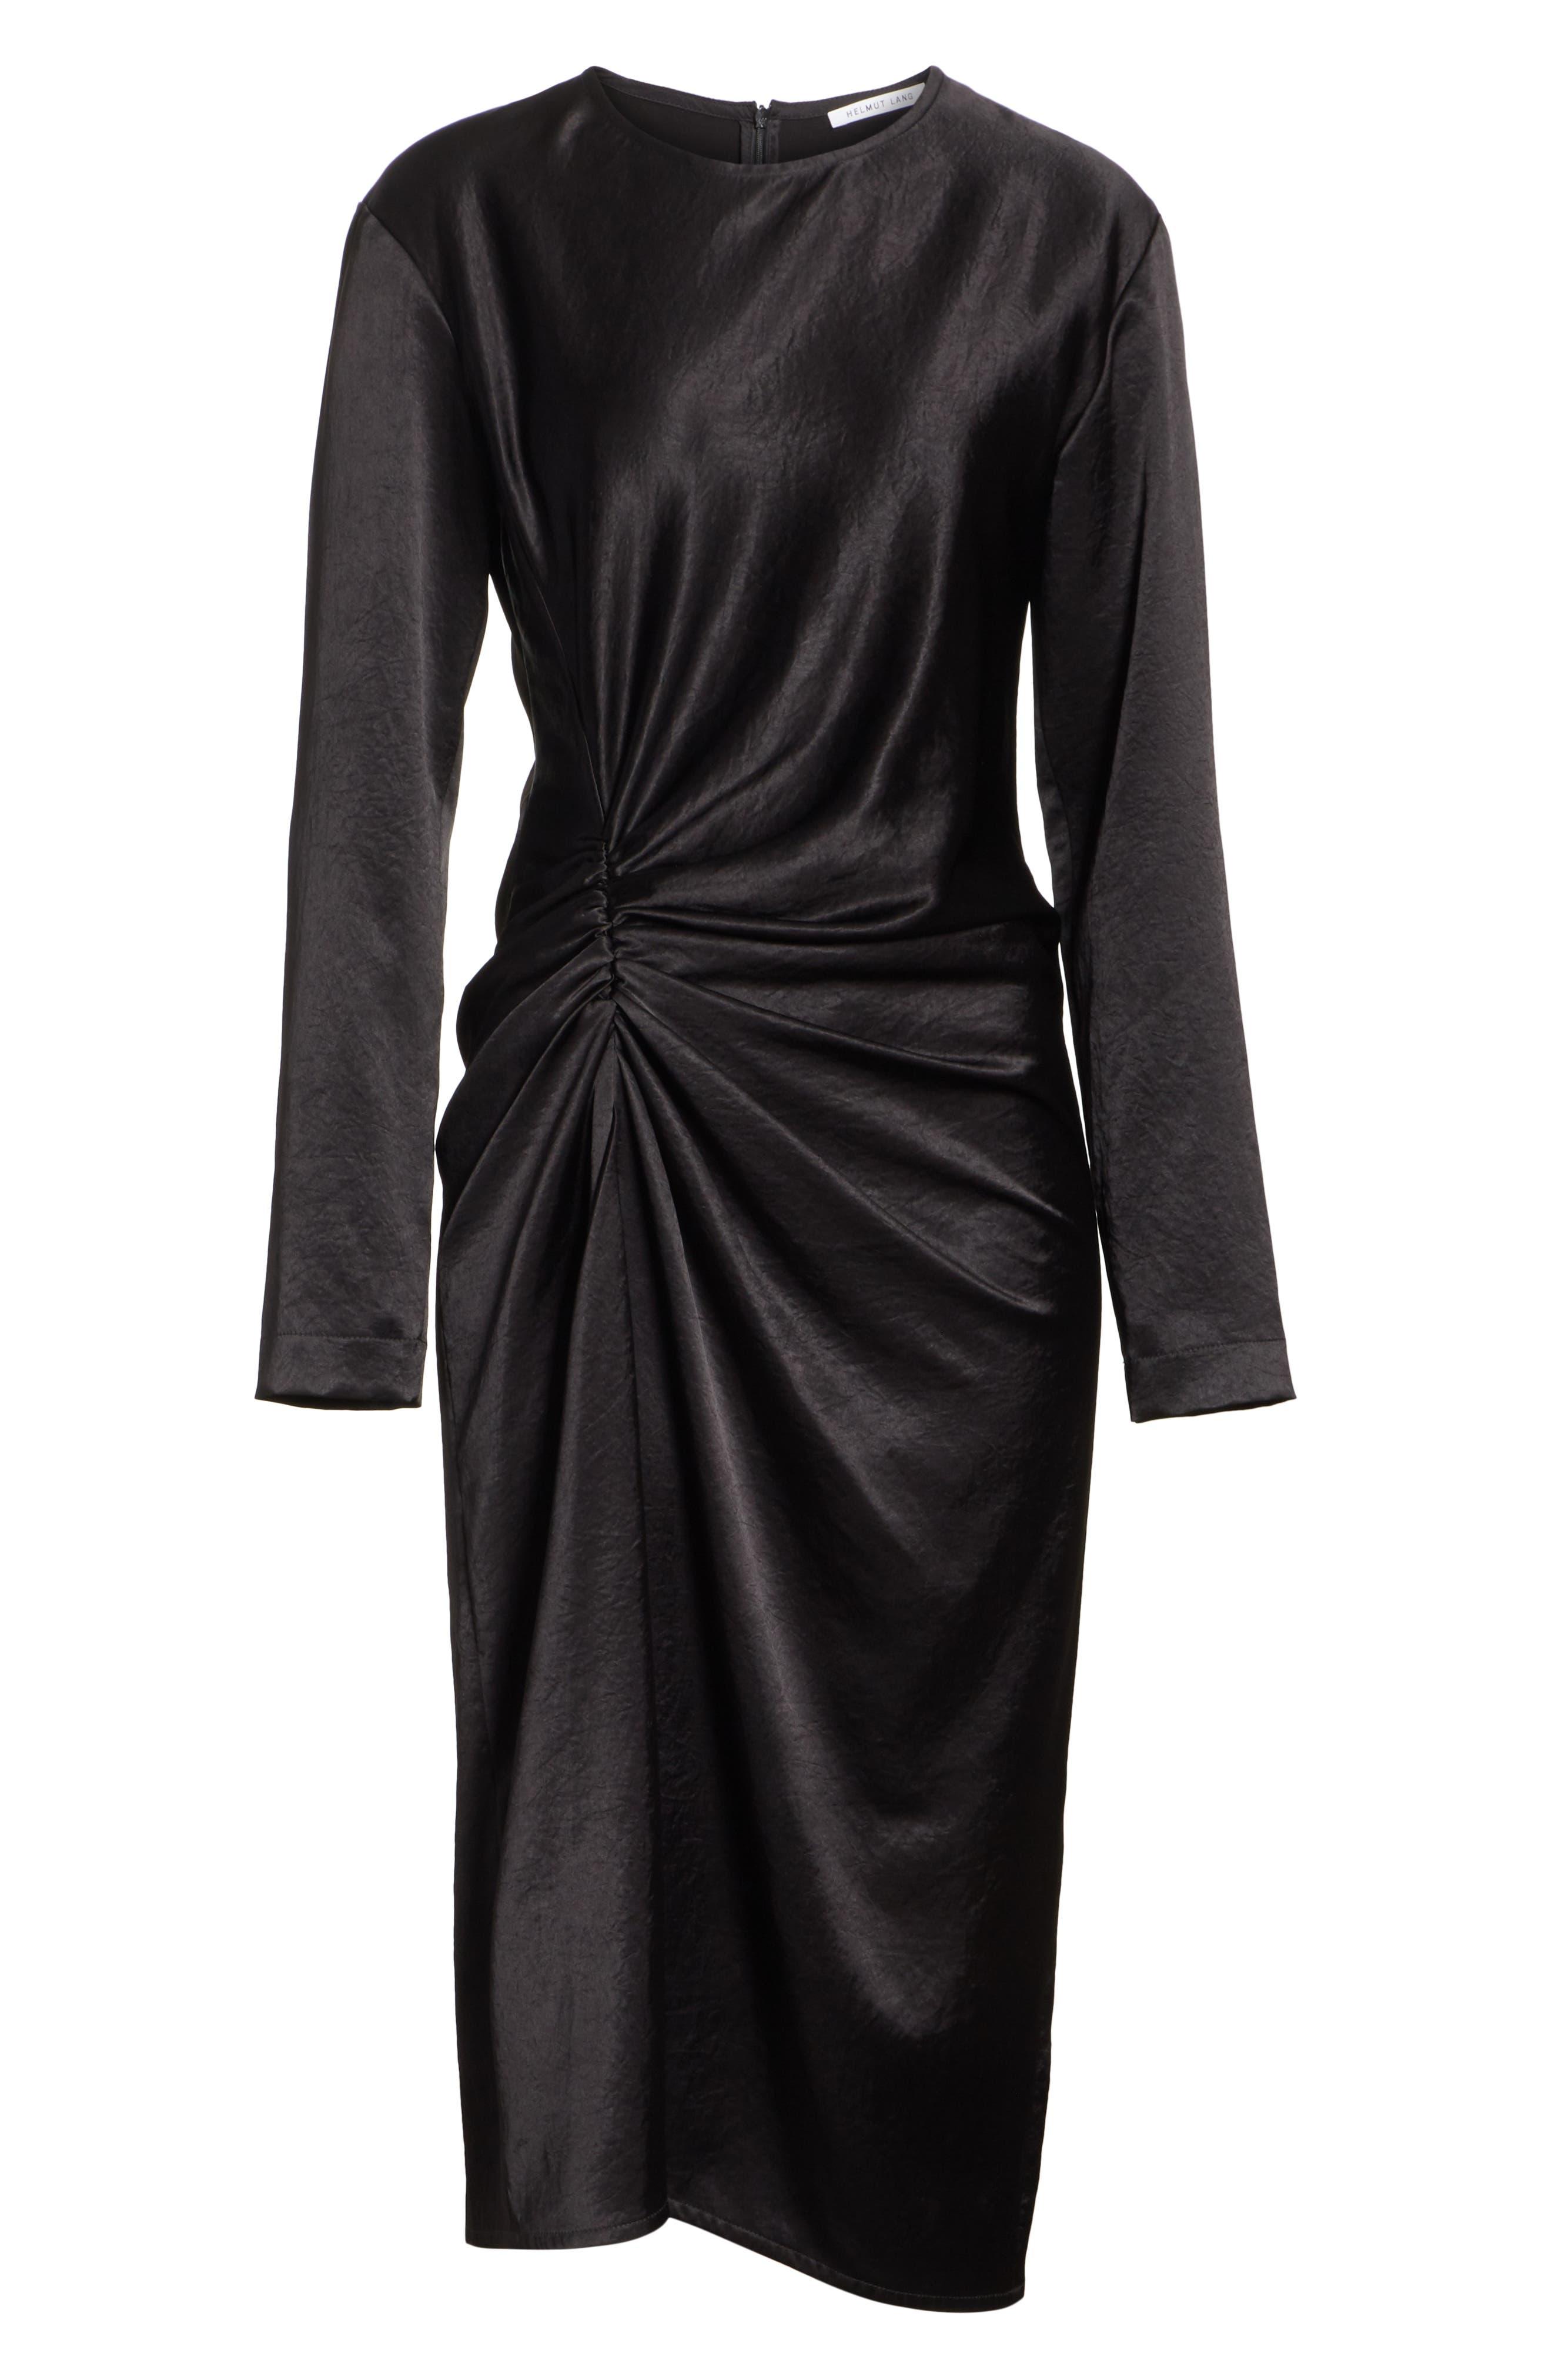 Ruched Crinkle Satin Dress,                             Alternate thumbnail 7, color,                             001